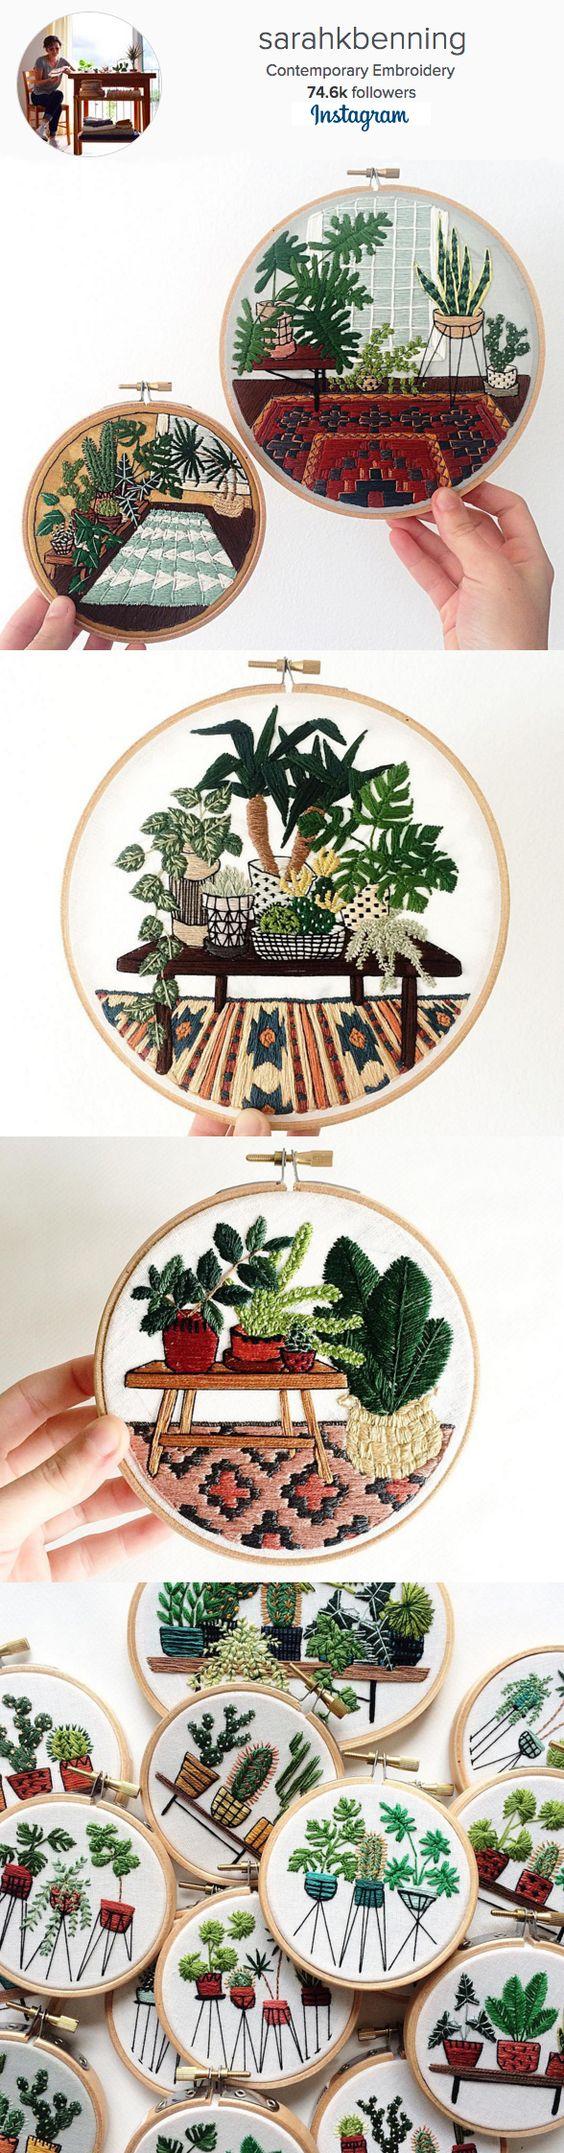 Sarah K Benning, Contemporary Embroidery | Instagram: